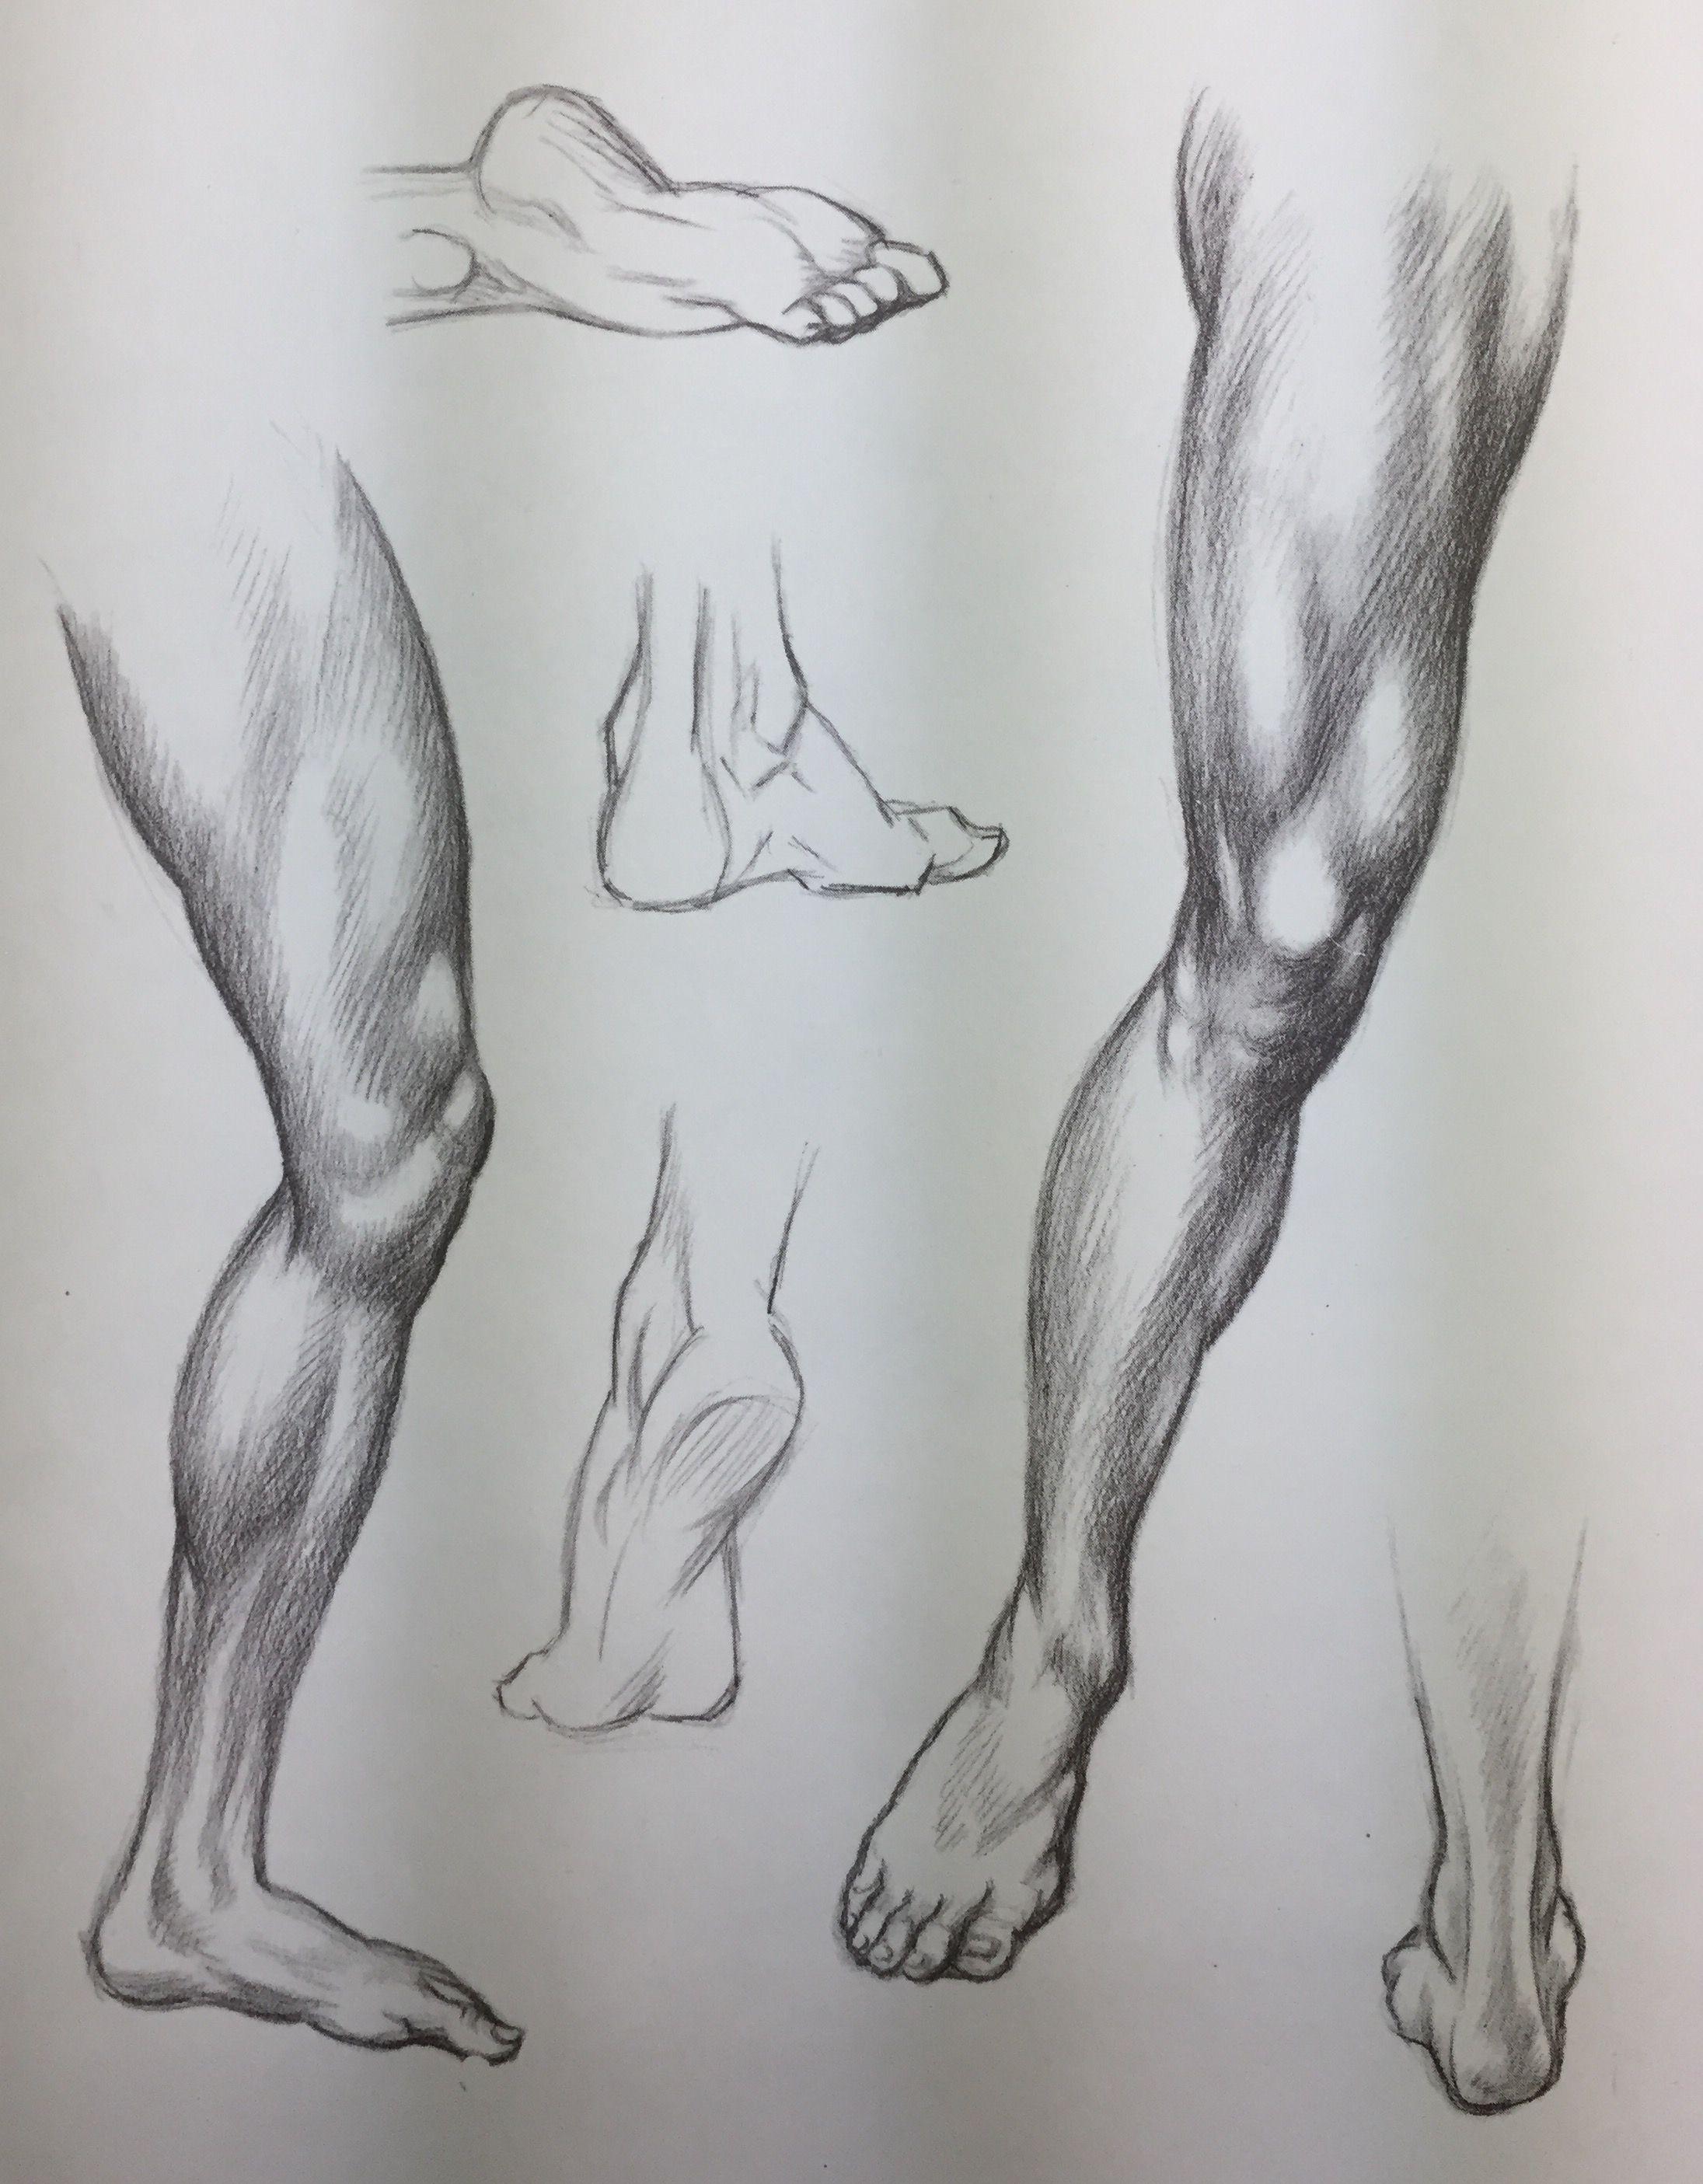 Human Legs Drawing : human, drawing, Yasin, Tolga, Başaran, Didáctica, Human, Anatomy, Sketches,, Drawing